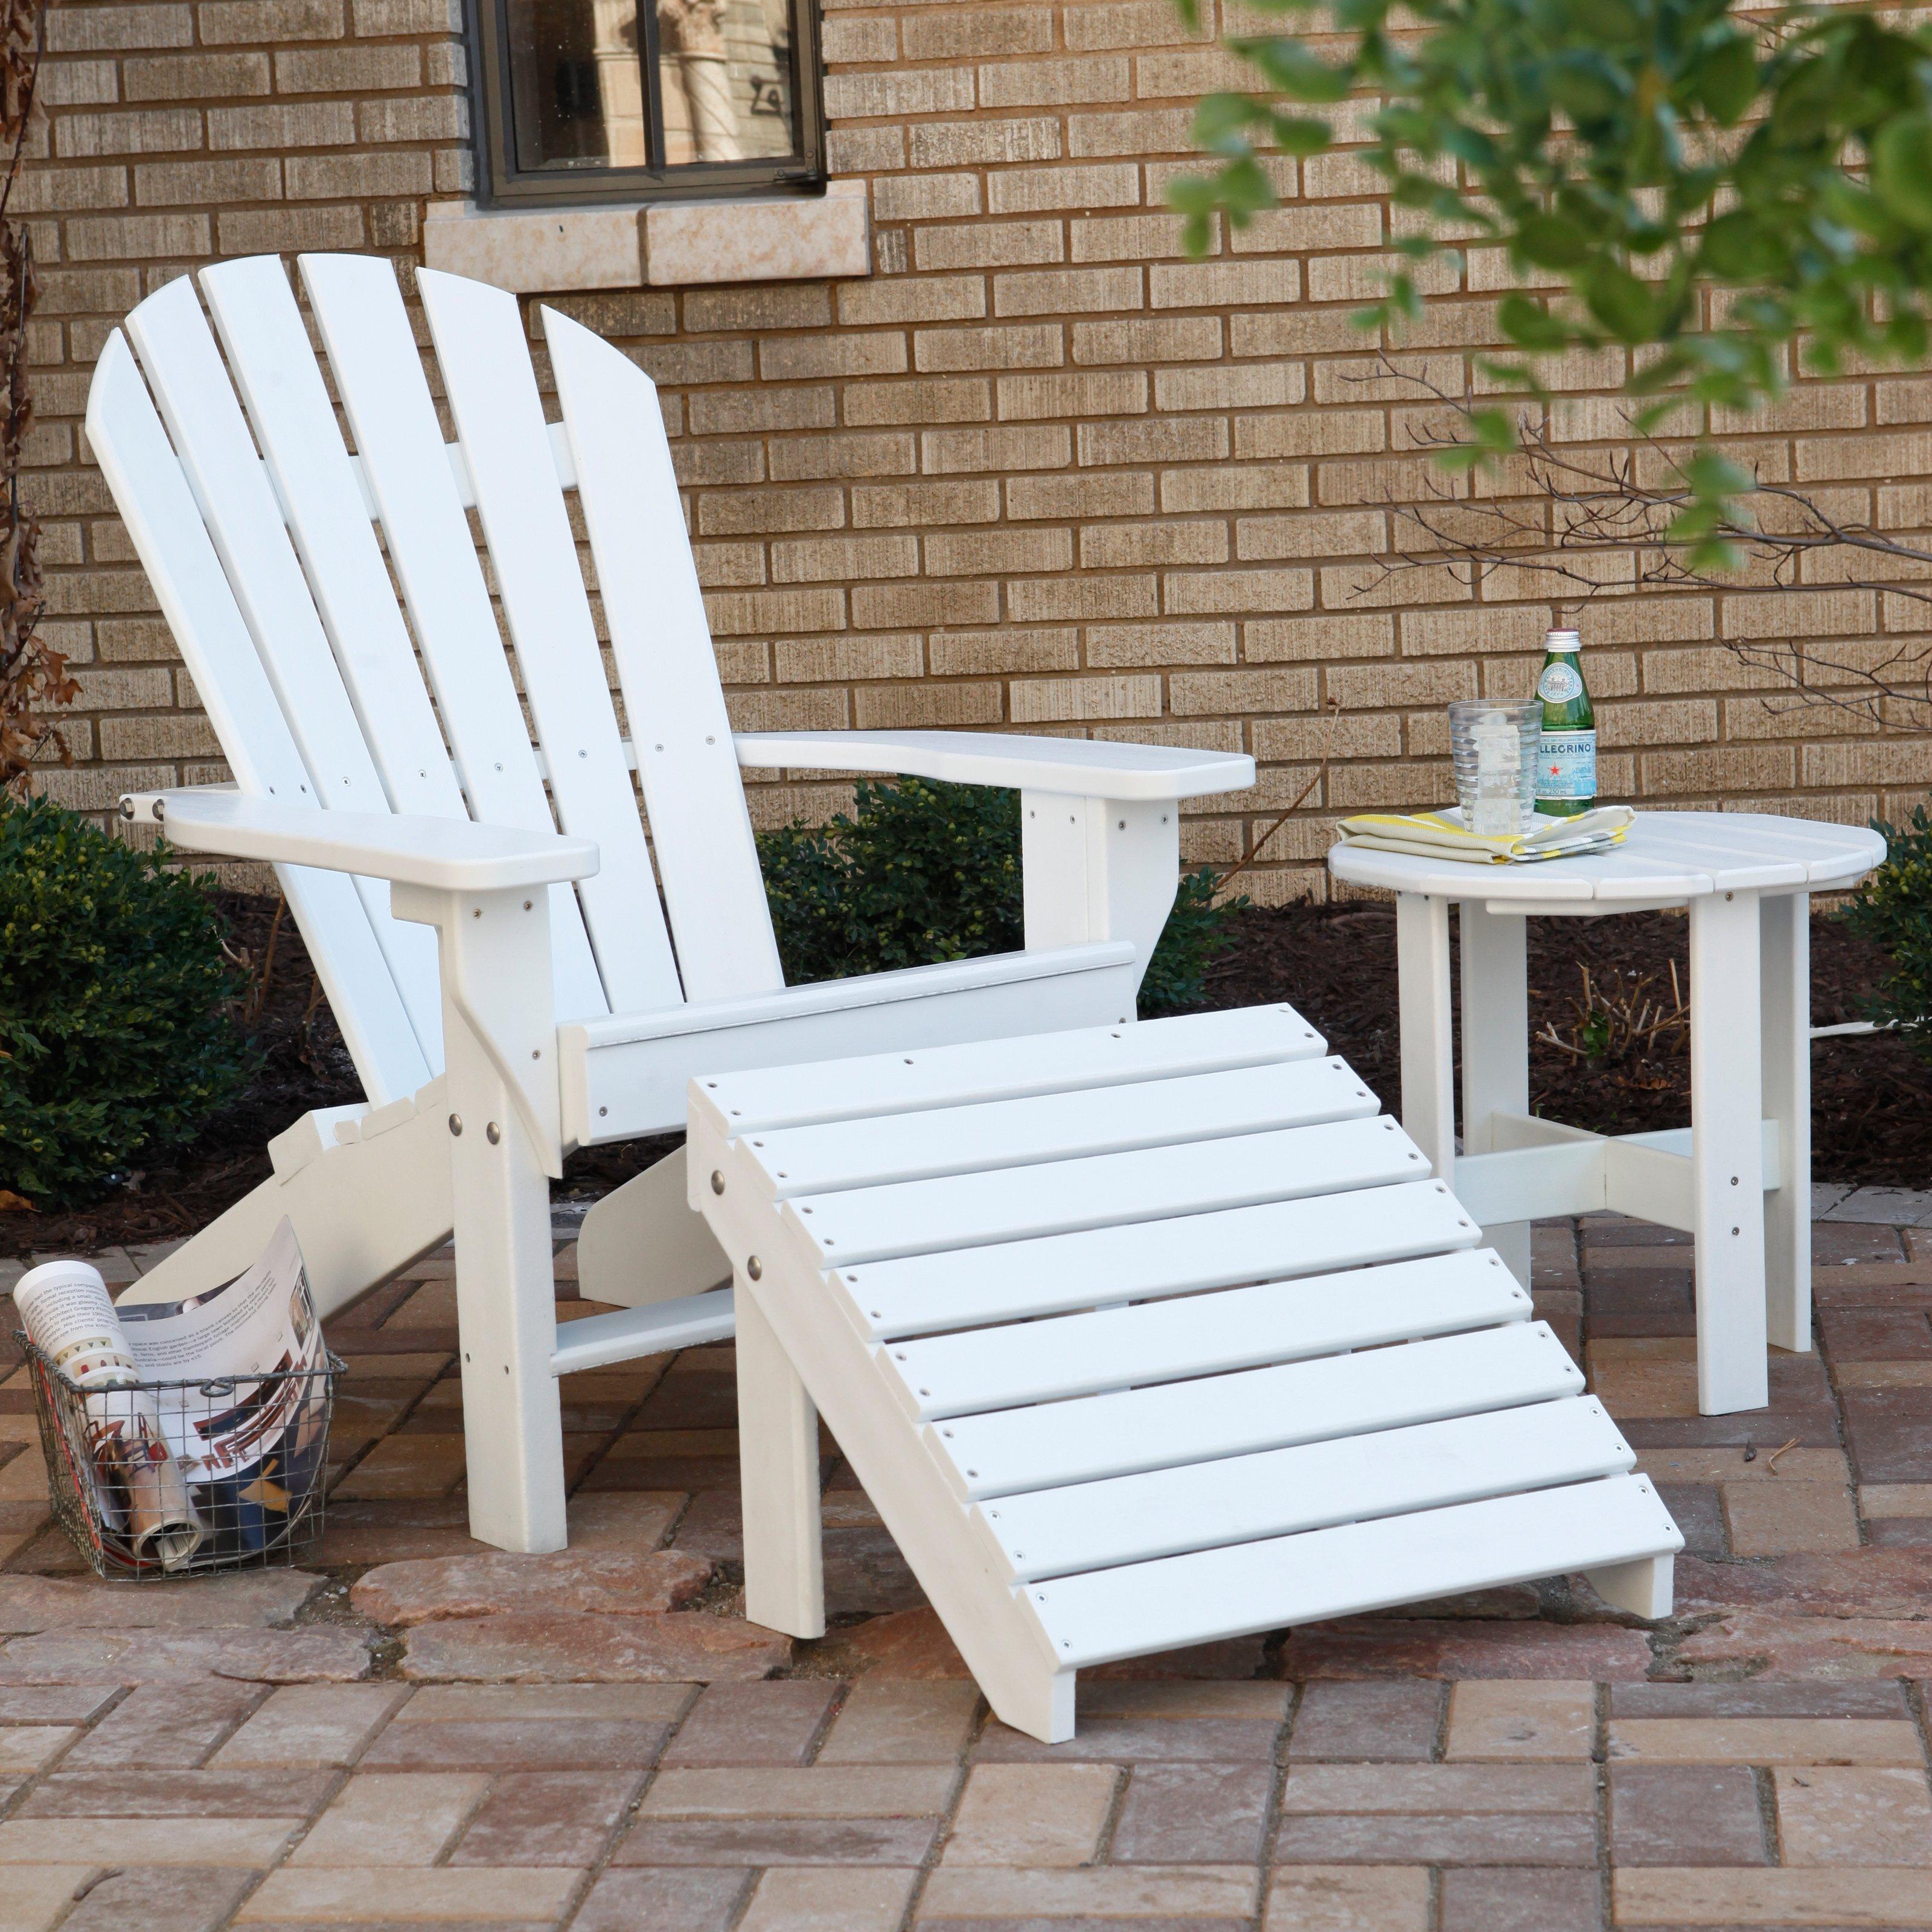 Jayhawk Plastics Seaside Adirondack Chair With Ottoman and Side Table